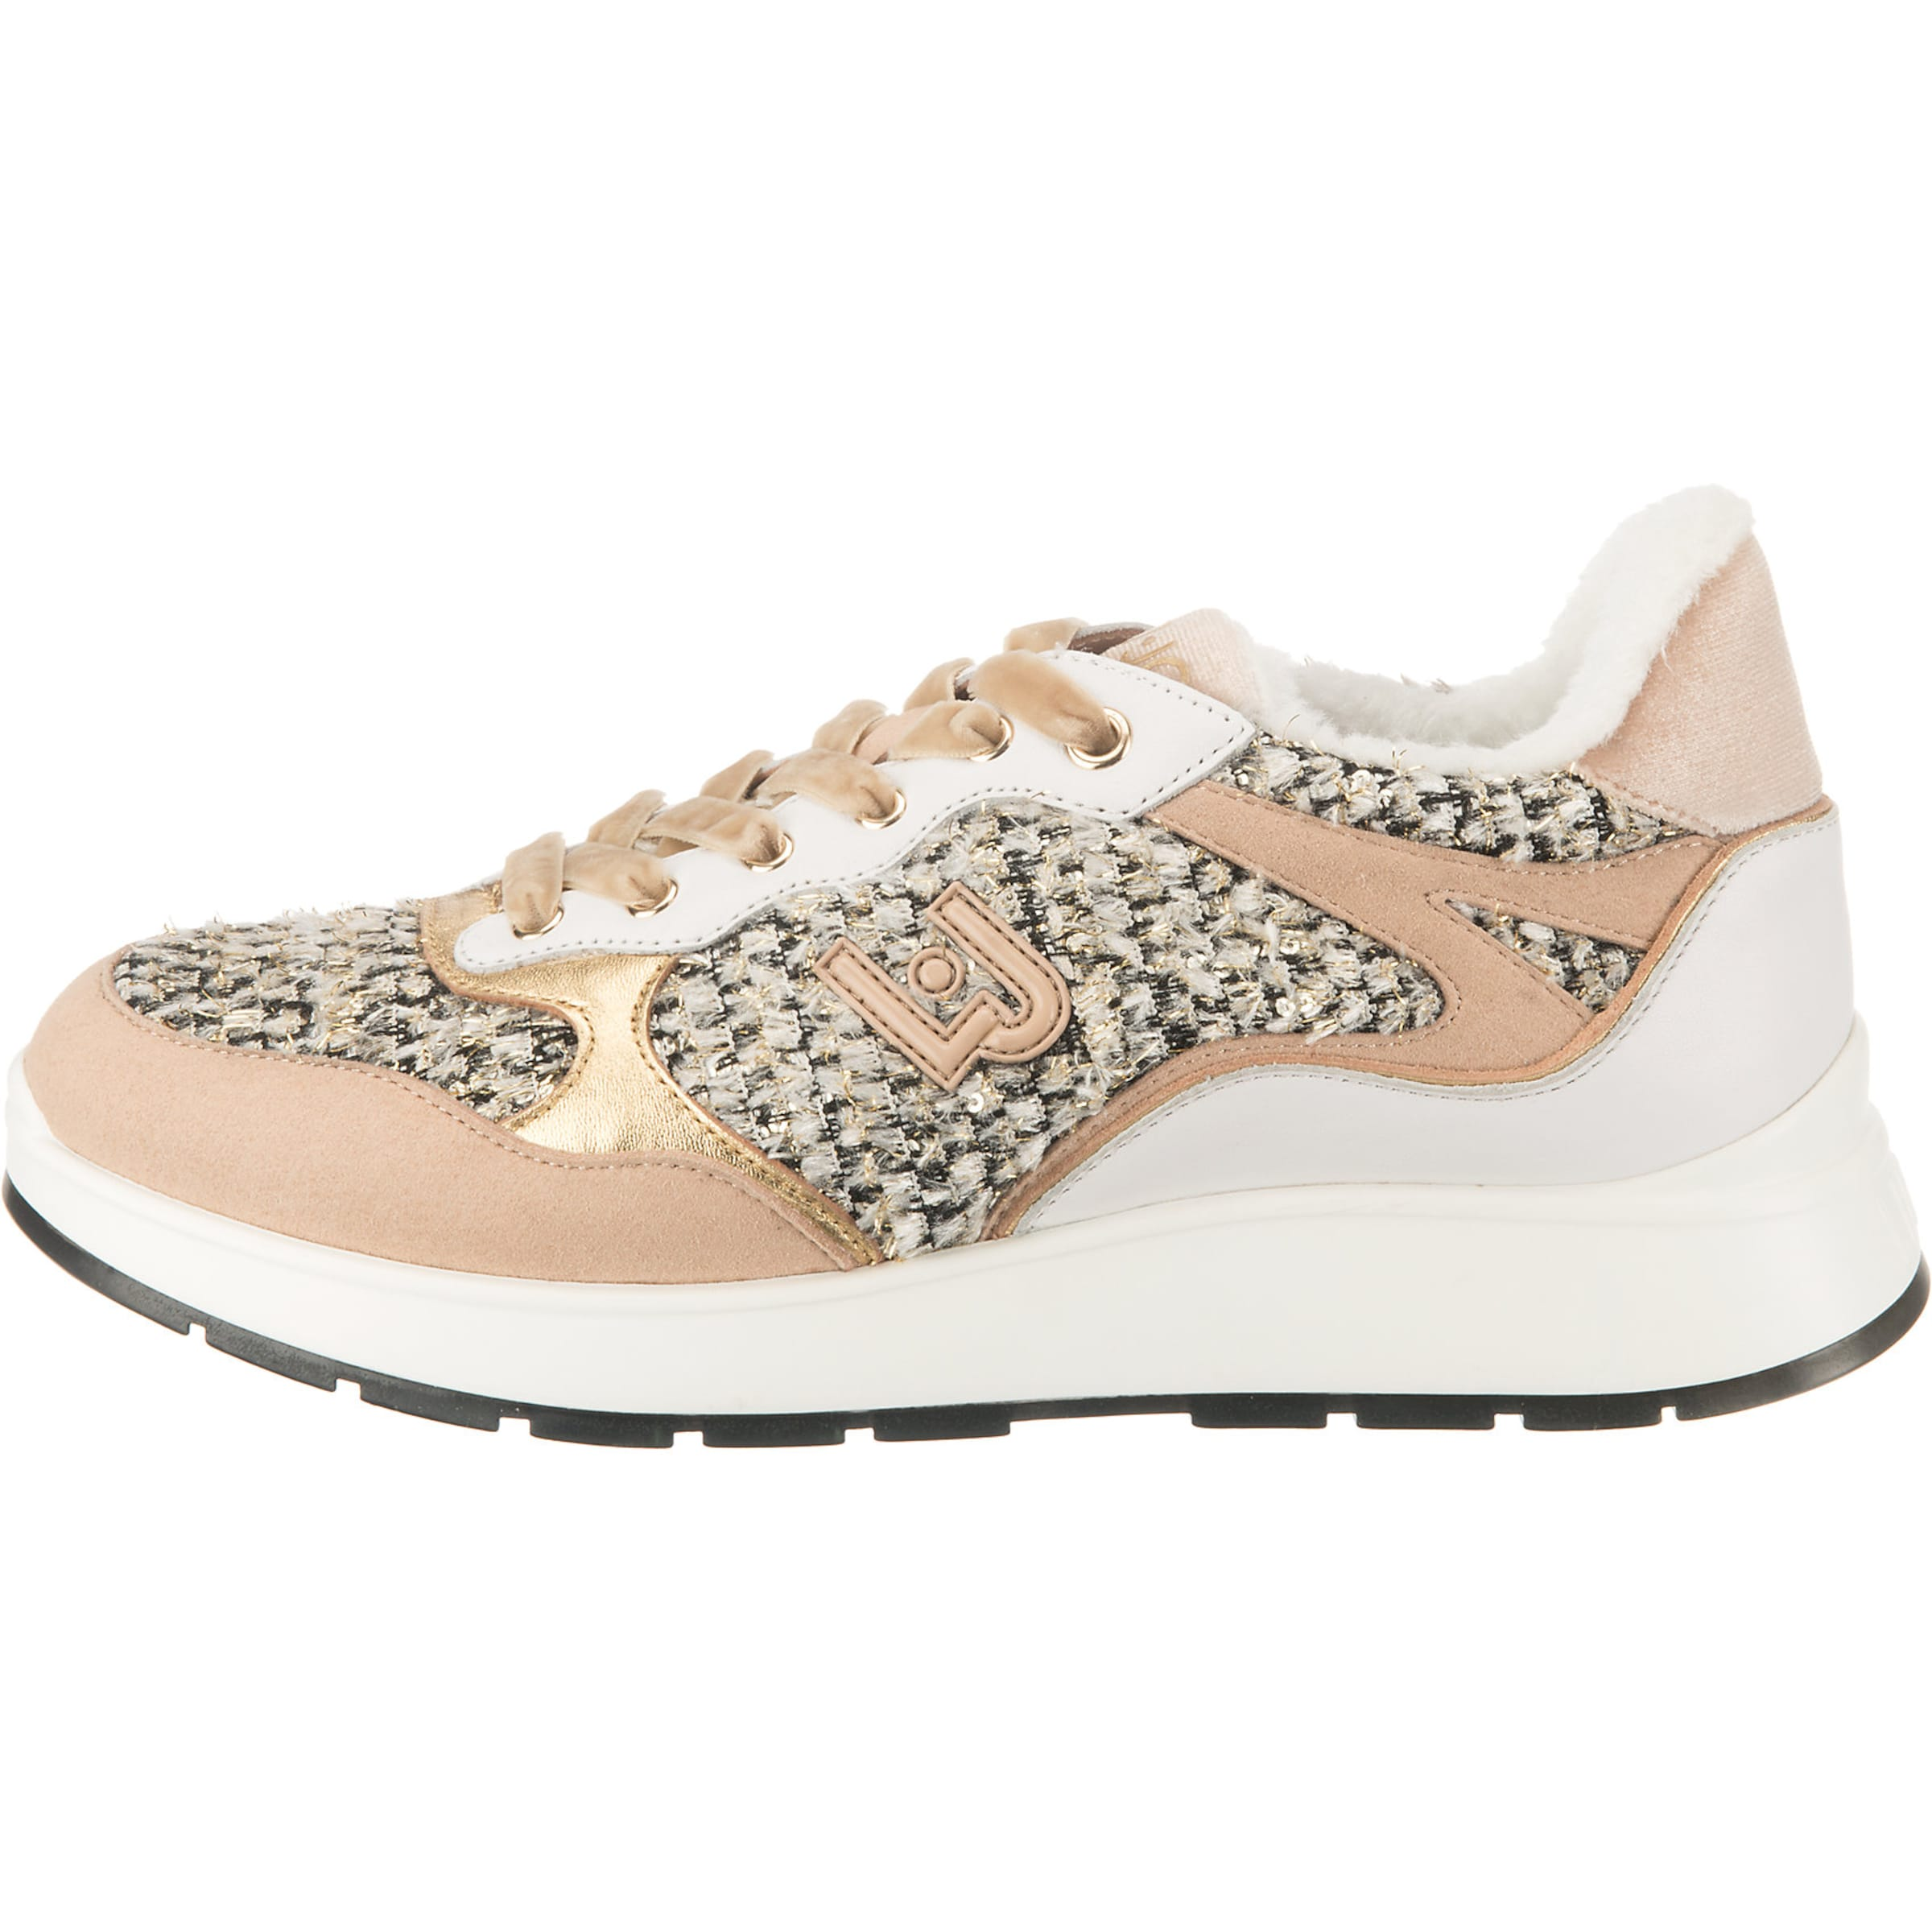 Jo Sneakers 06' GoldPfirsich Weiß Liu 'asia In tshCxQrd